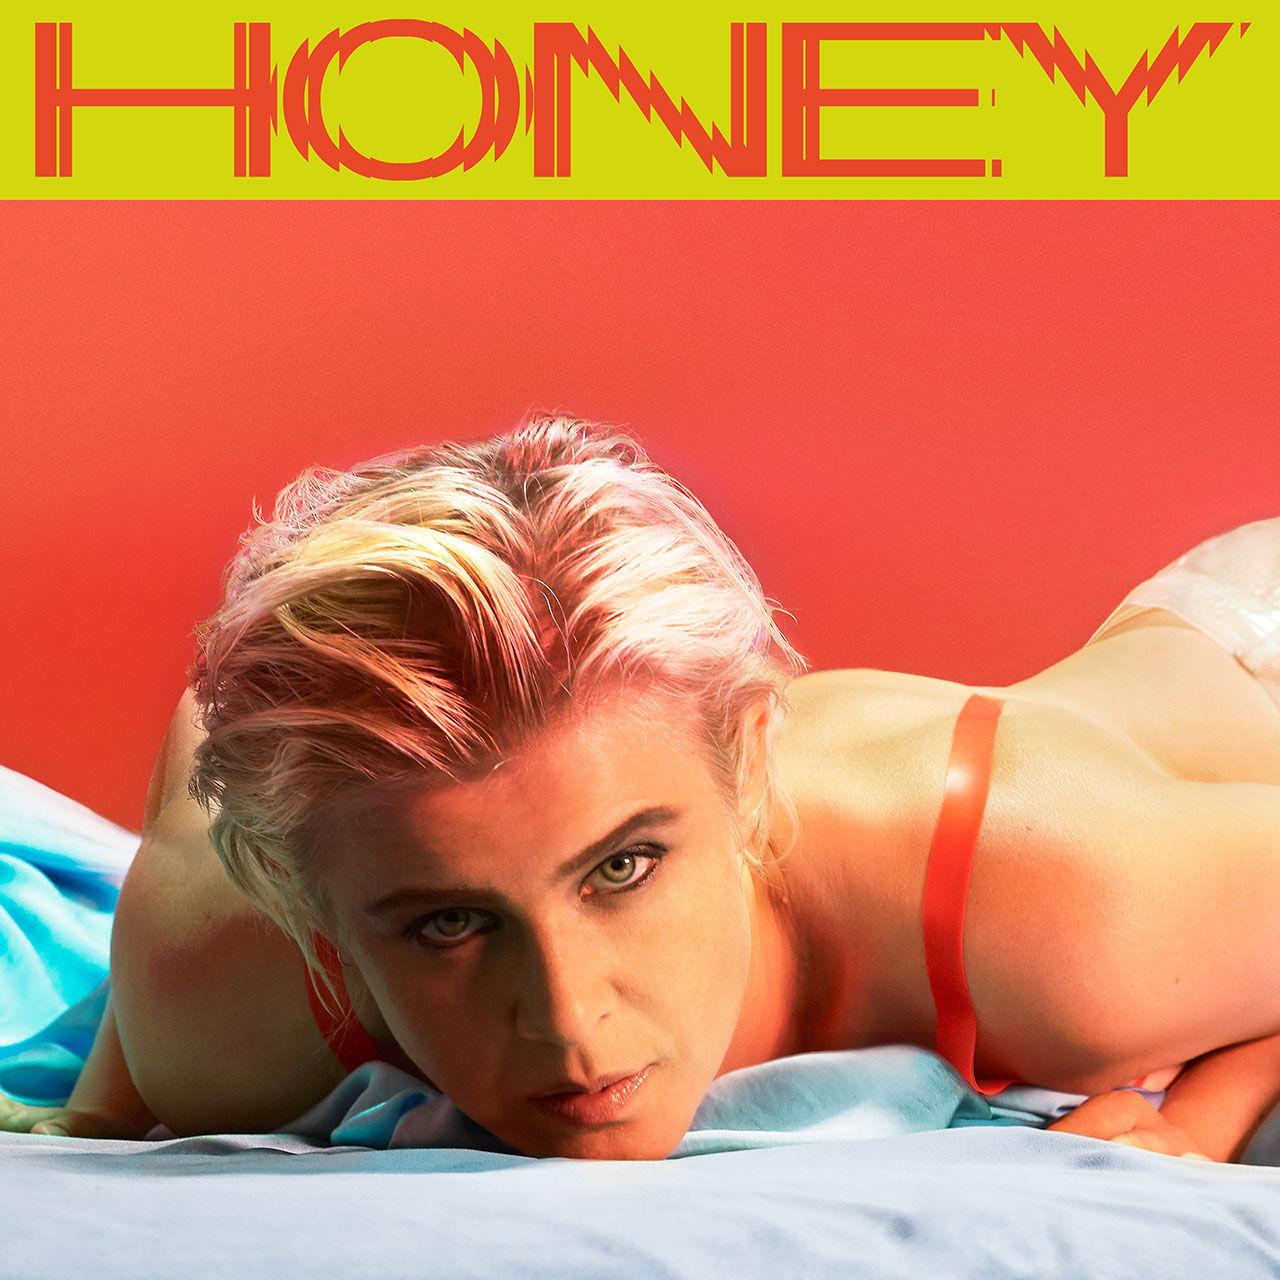 Robyns nya album släpps den 26 oktober